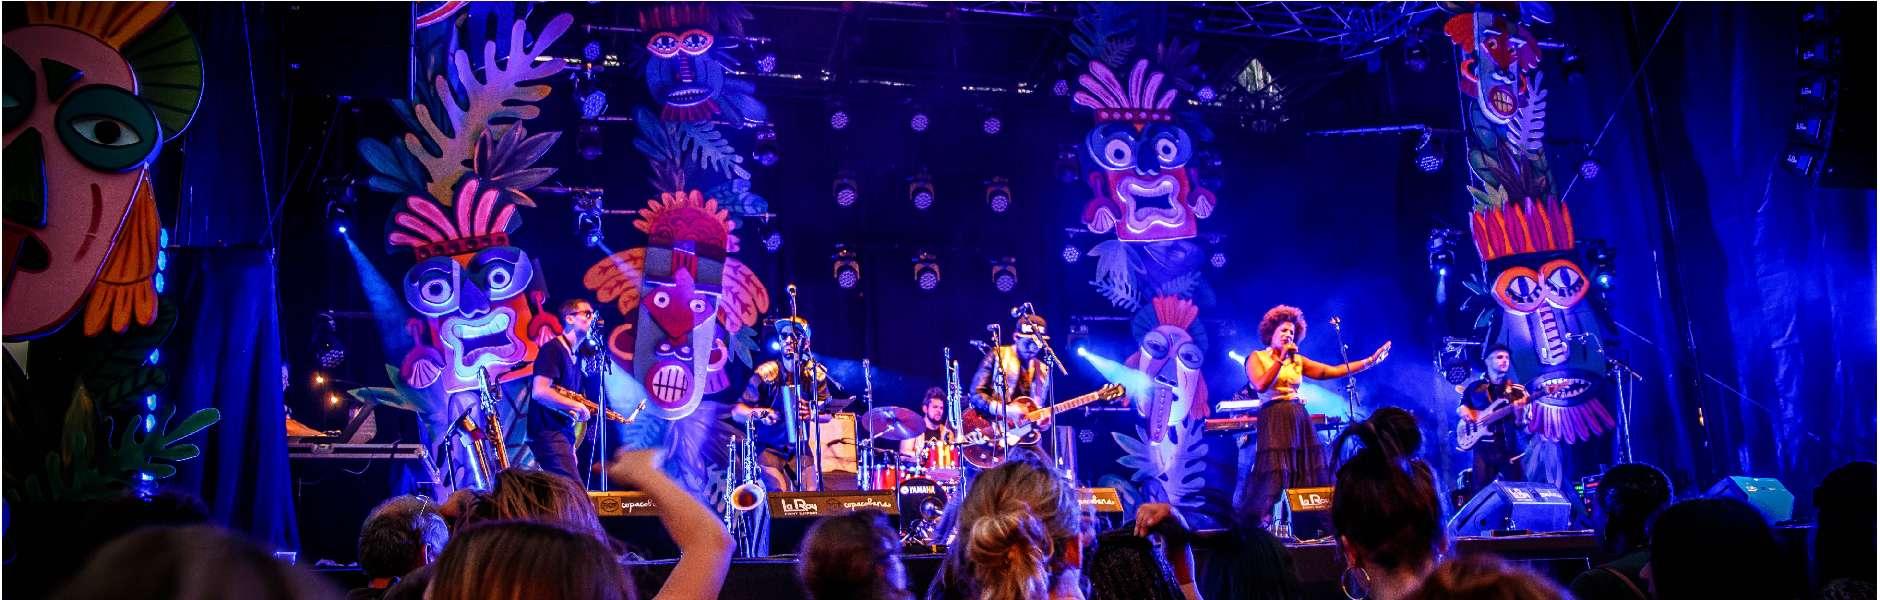 Copacobana Festival